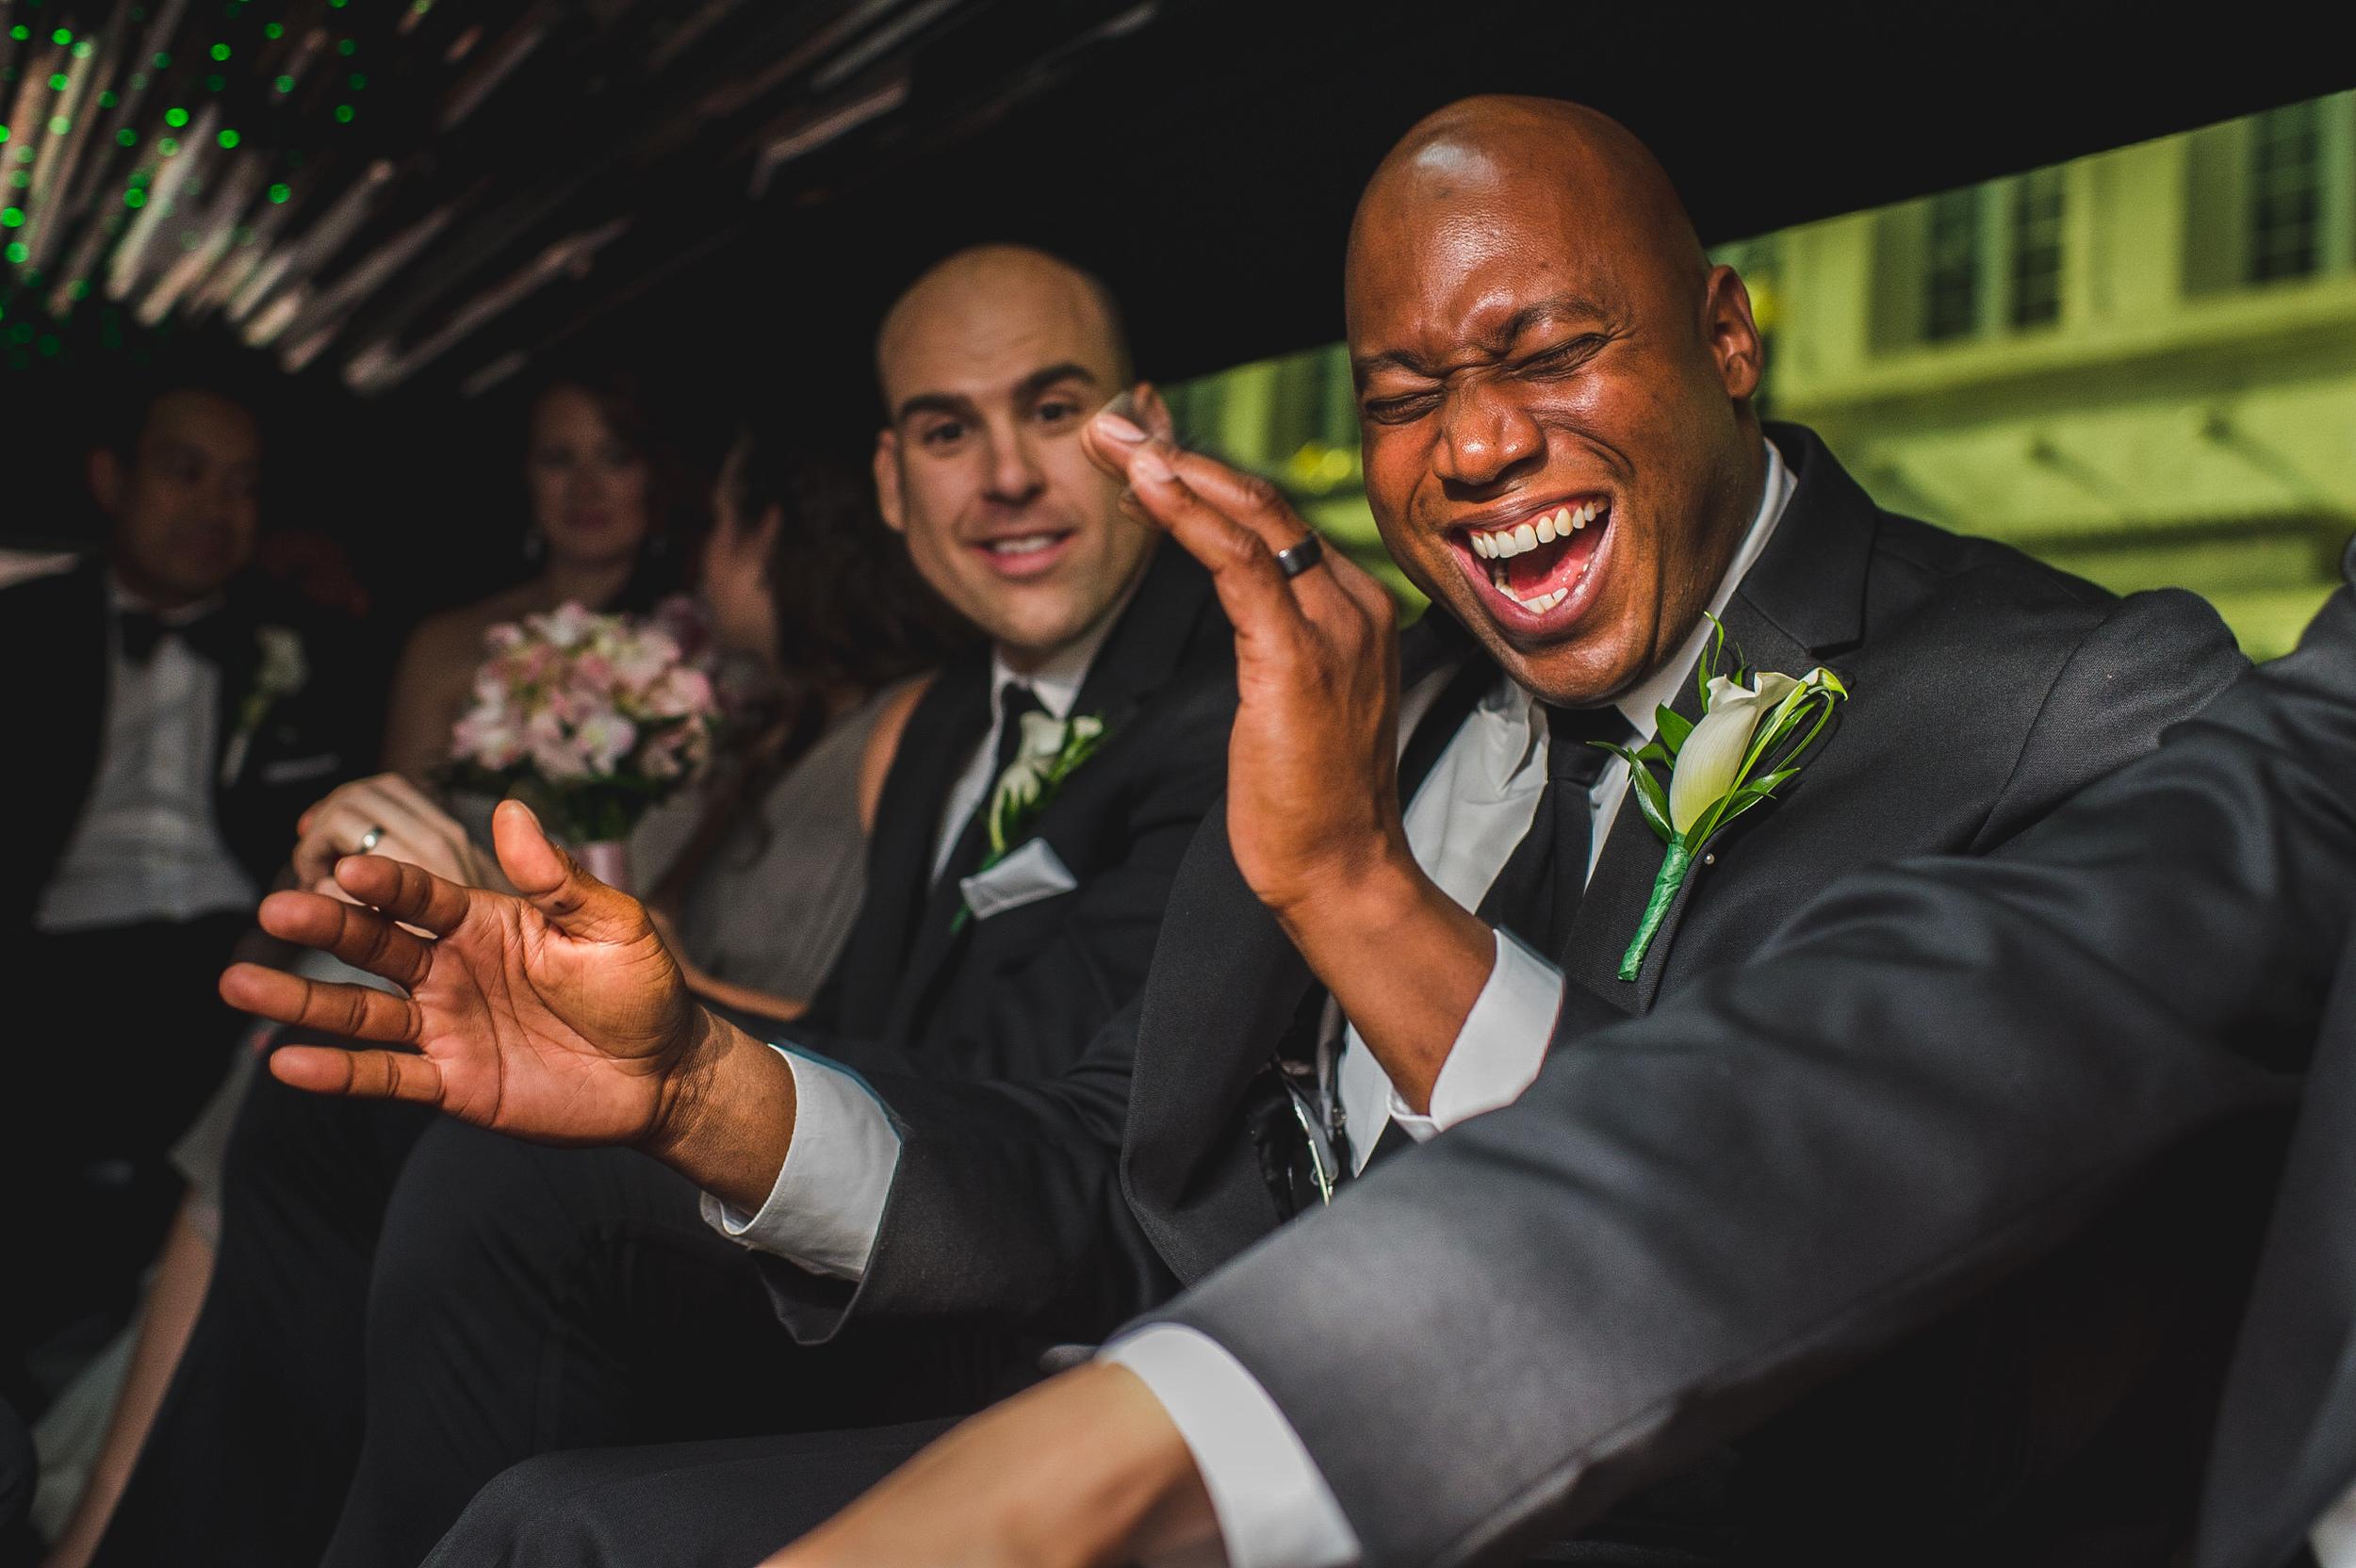 Wedding at W Hotel Washington DC by Mantas Kubilinskas-10.jpg